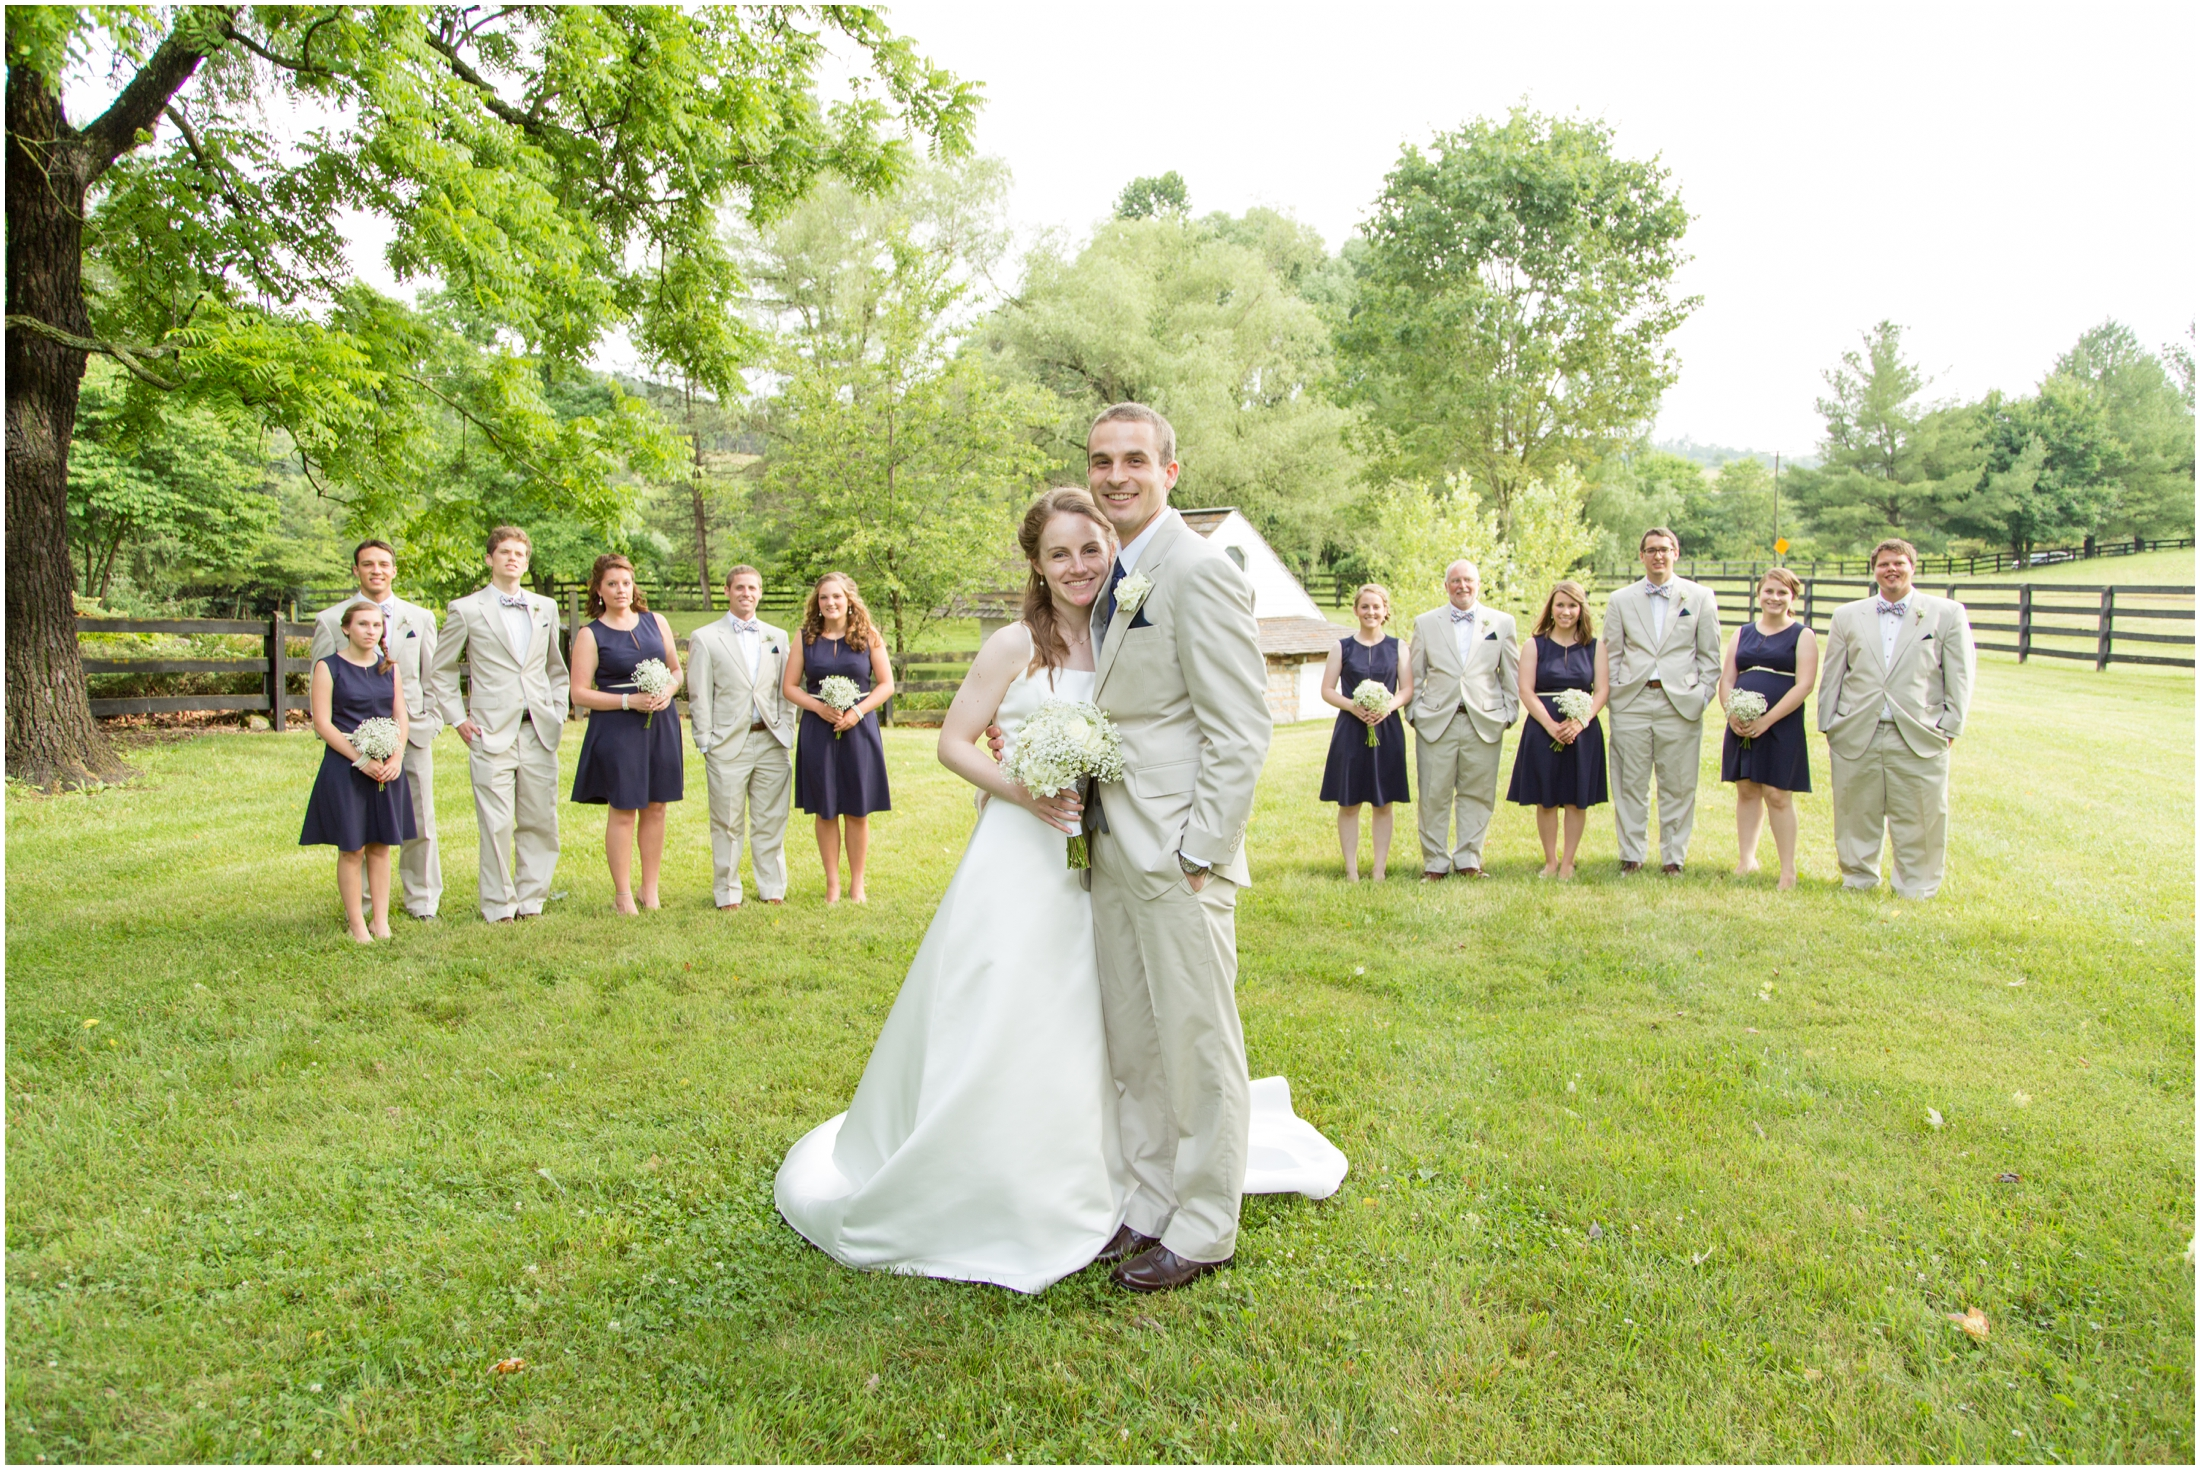 Nash-Wedding-Bridal-Party-732.jpg